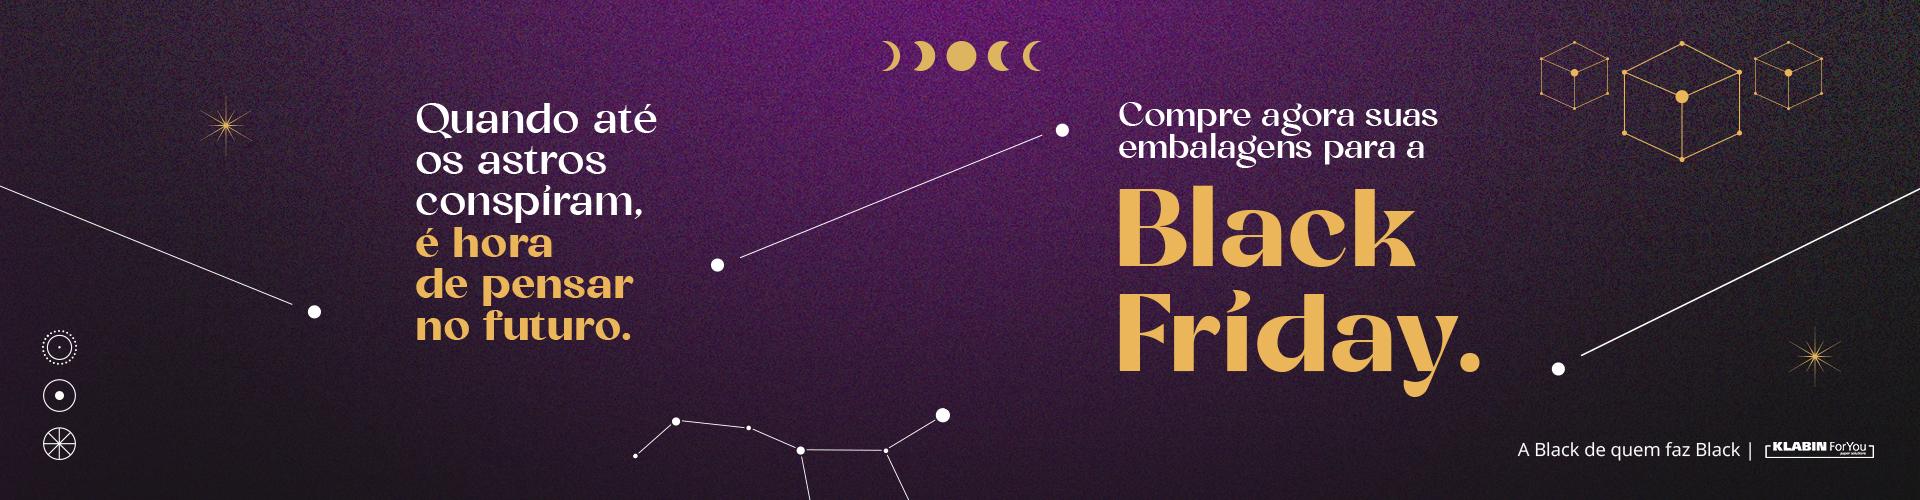 Black Friday - Campanha